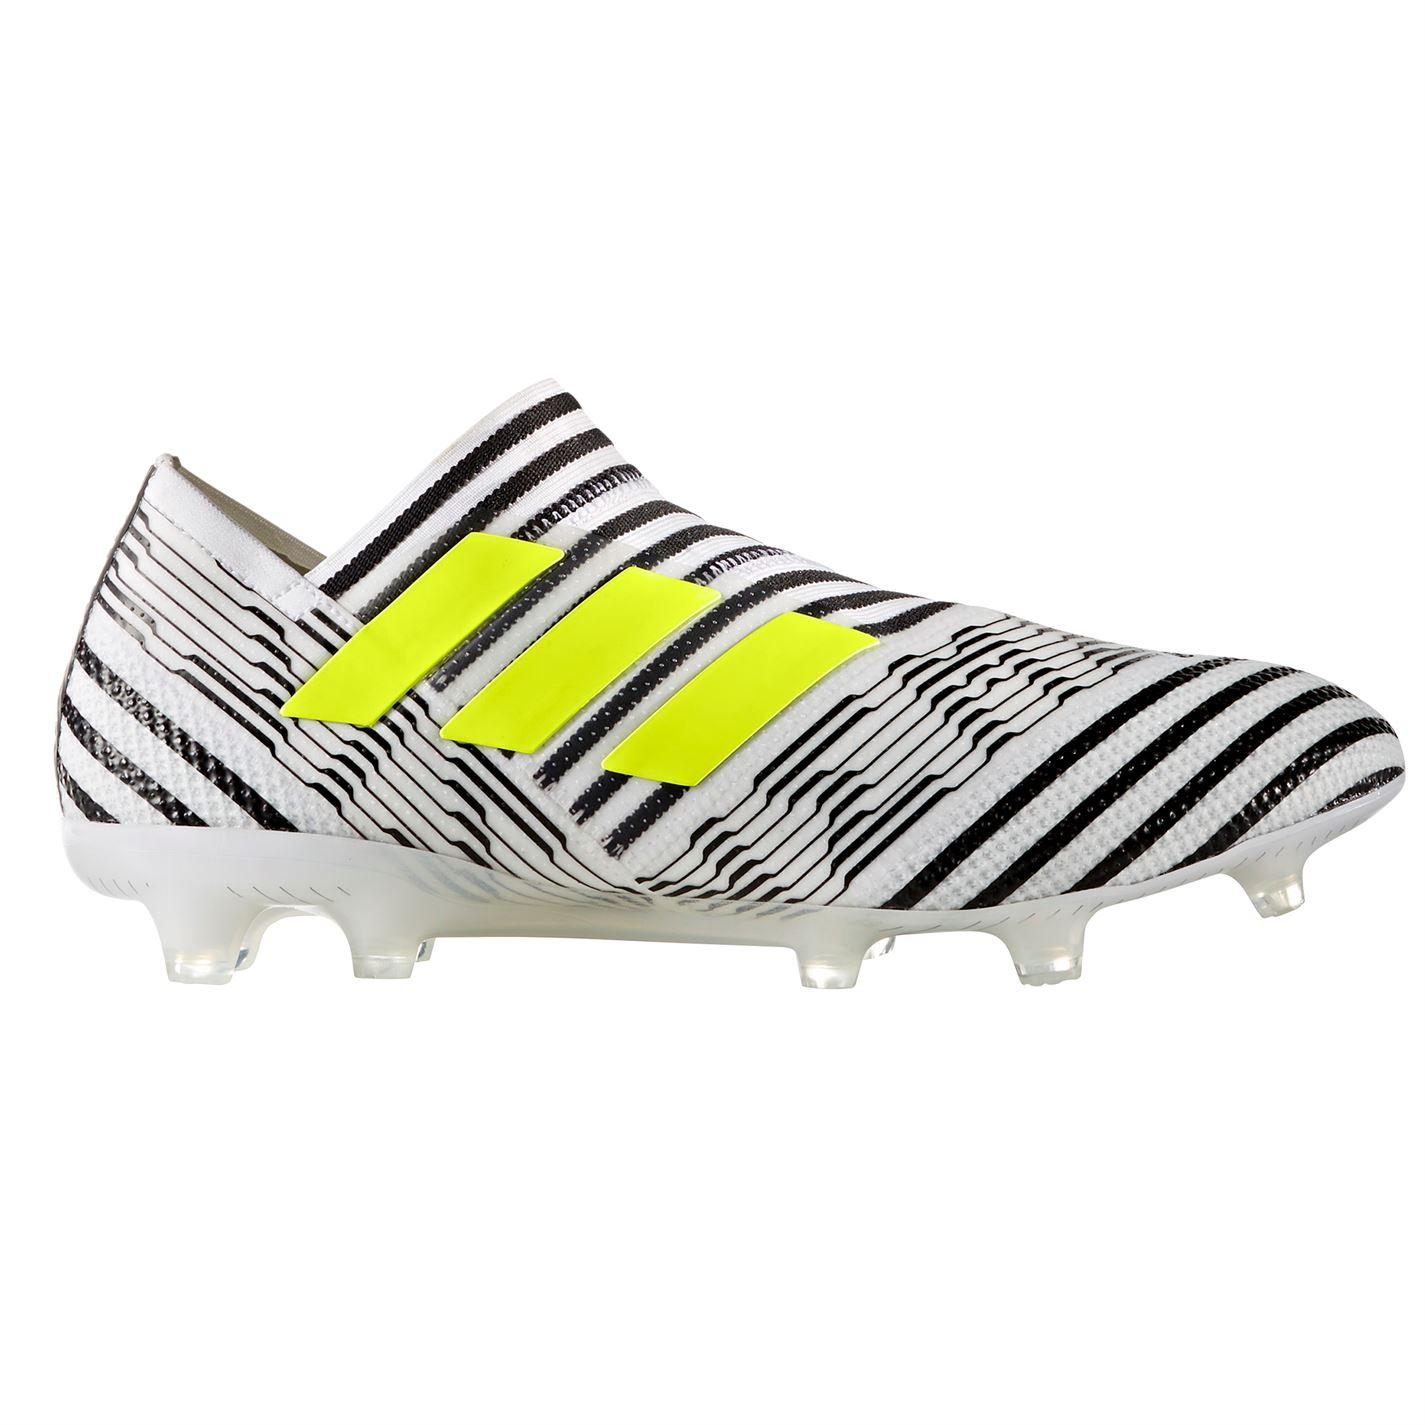 Adidas Nemeziz 17 Plus 360 Agility Pure FG Mens Laceless Football Boots